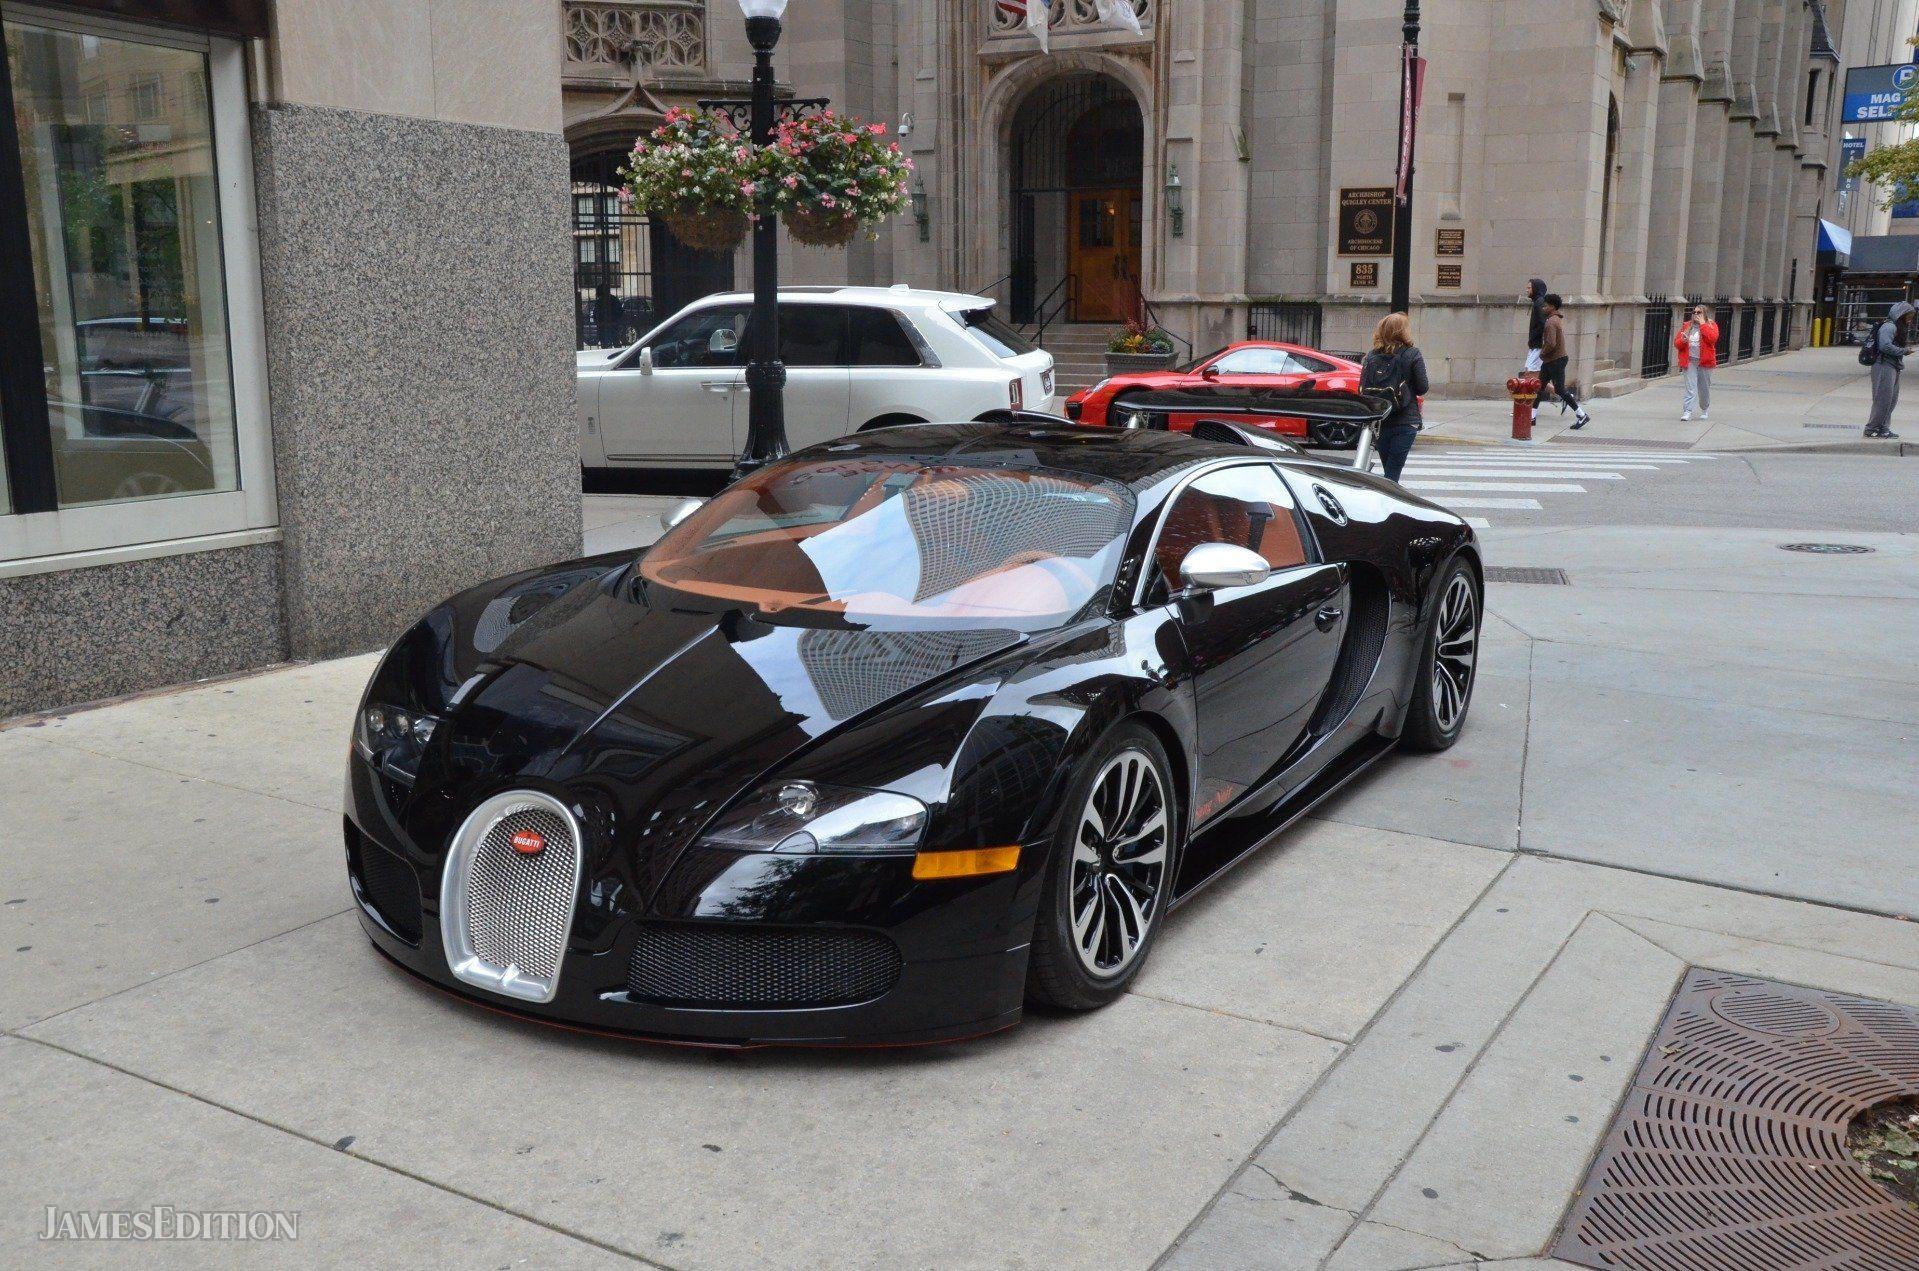 2010 Bugatti Veyron In Chicago Illinois United States For Sale 11093872